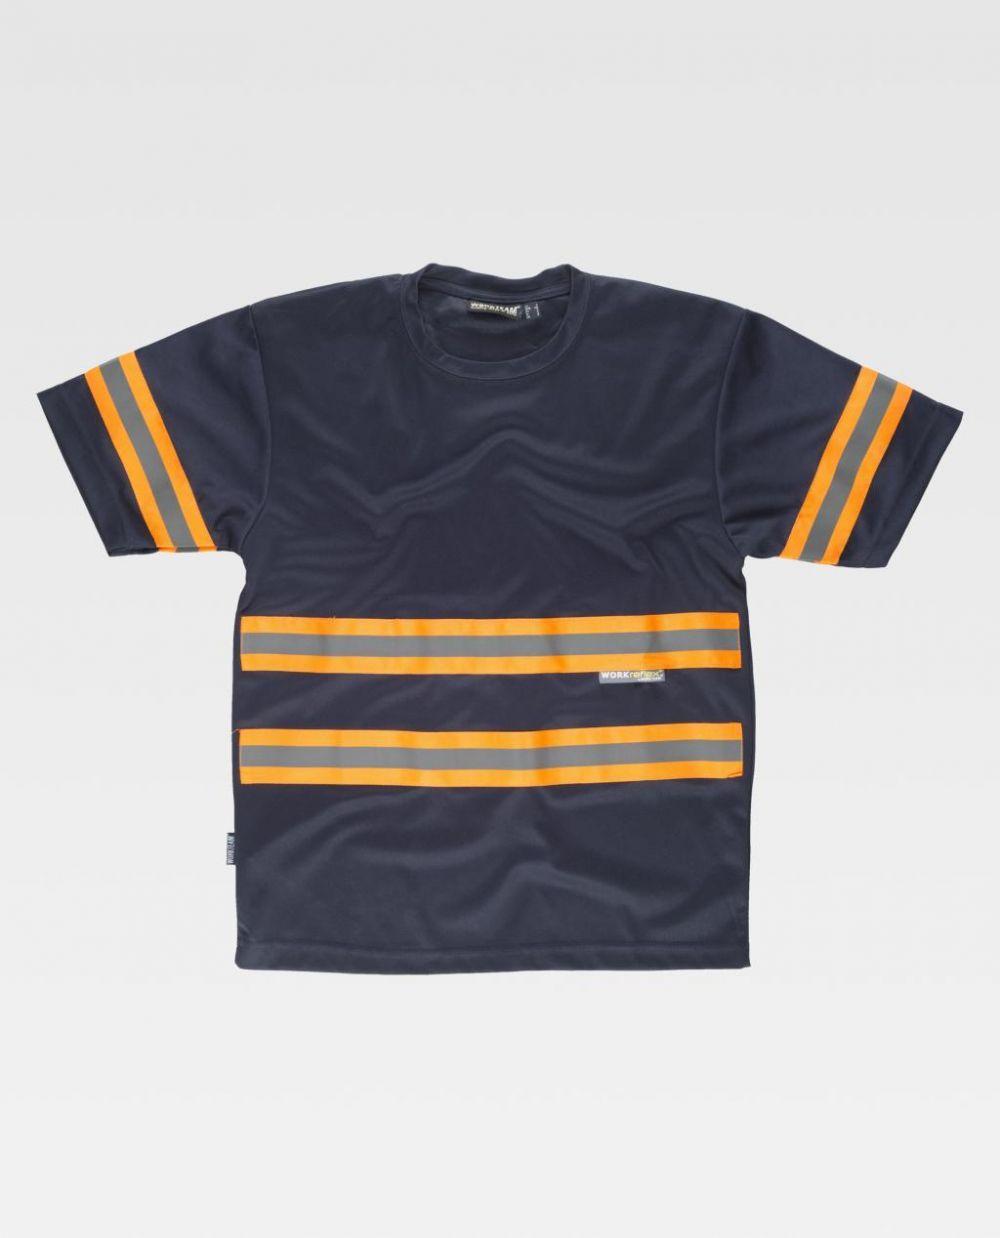 Camisetas reflectante workteam mc tejido pique de poliéster para personalizar vista 1